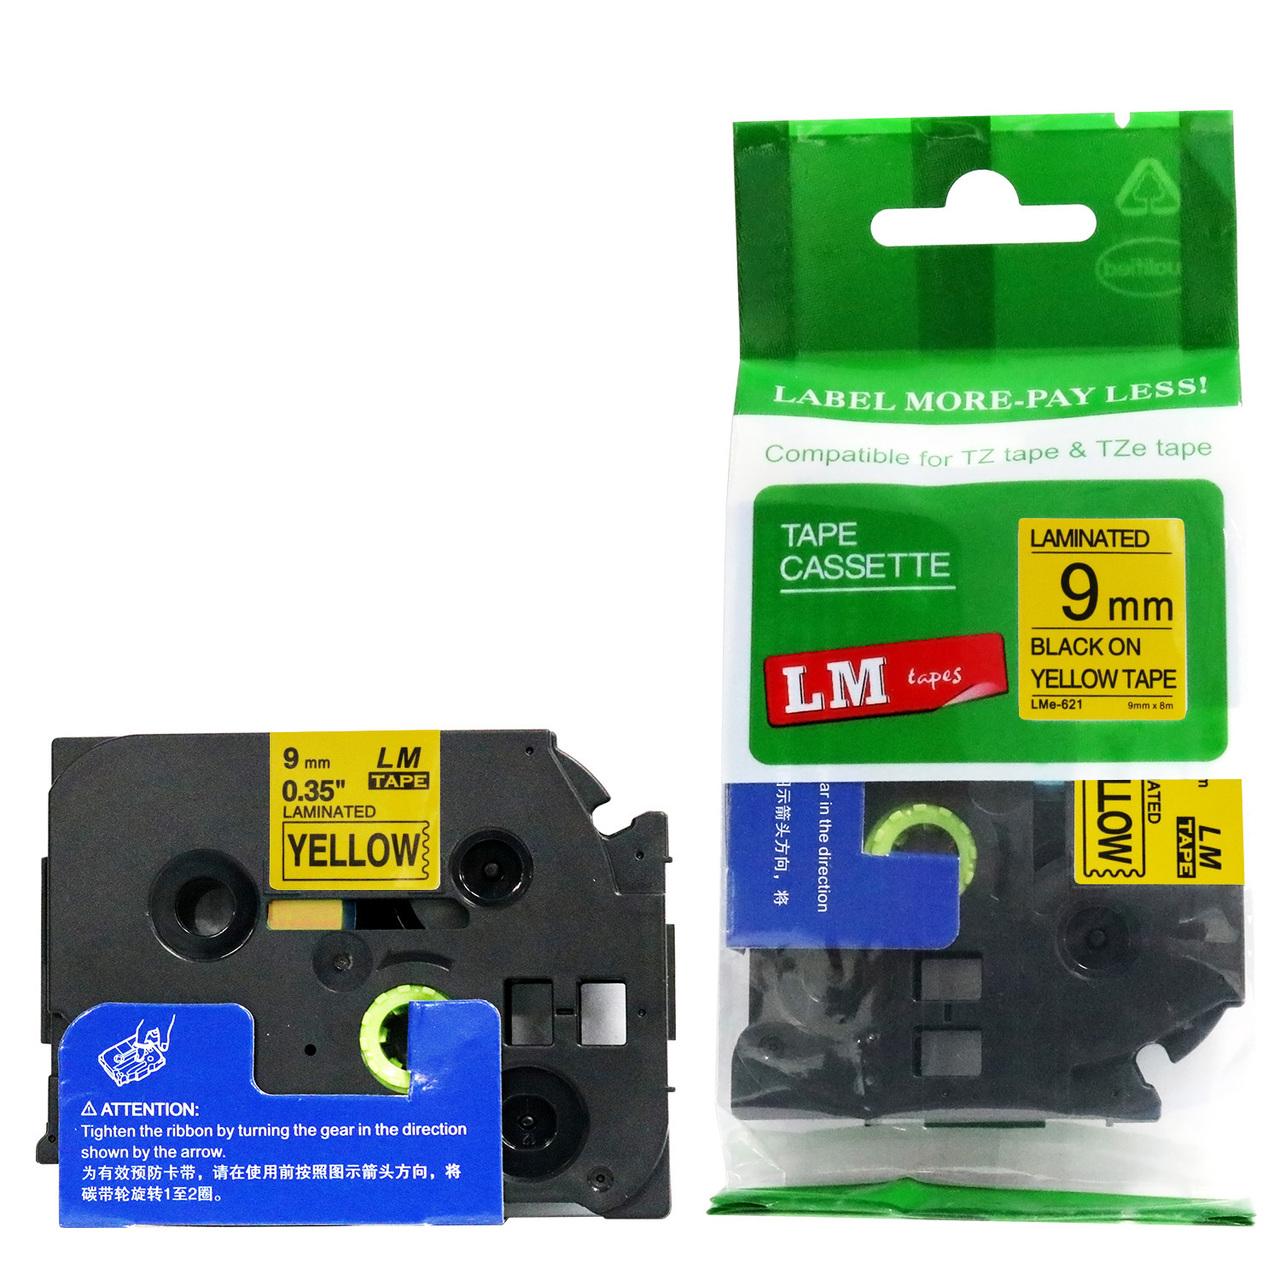 Details about  /9mm YELLOW Vinyl Sealing Tape Butchers Neck Sealer Tape Fruit Veg Food Sweets